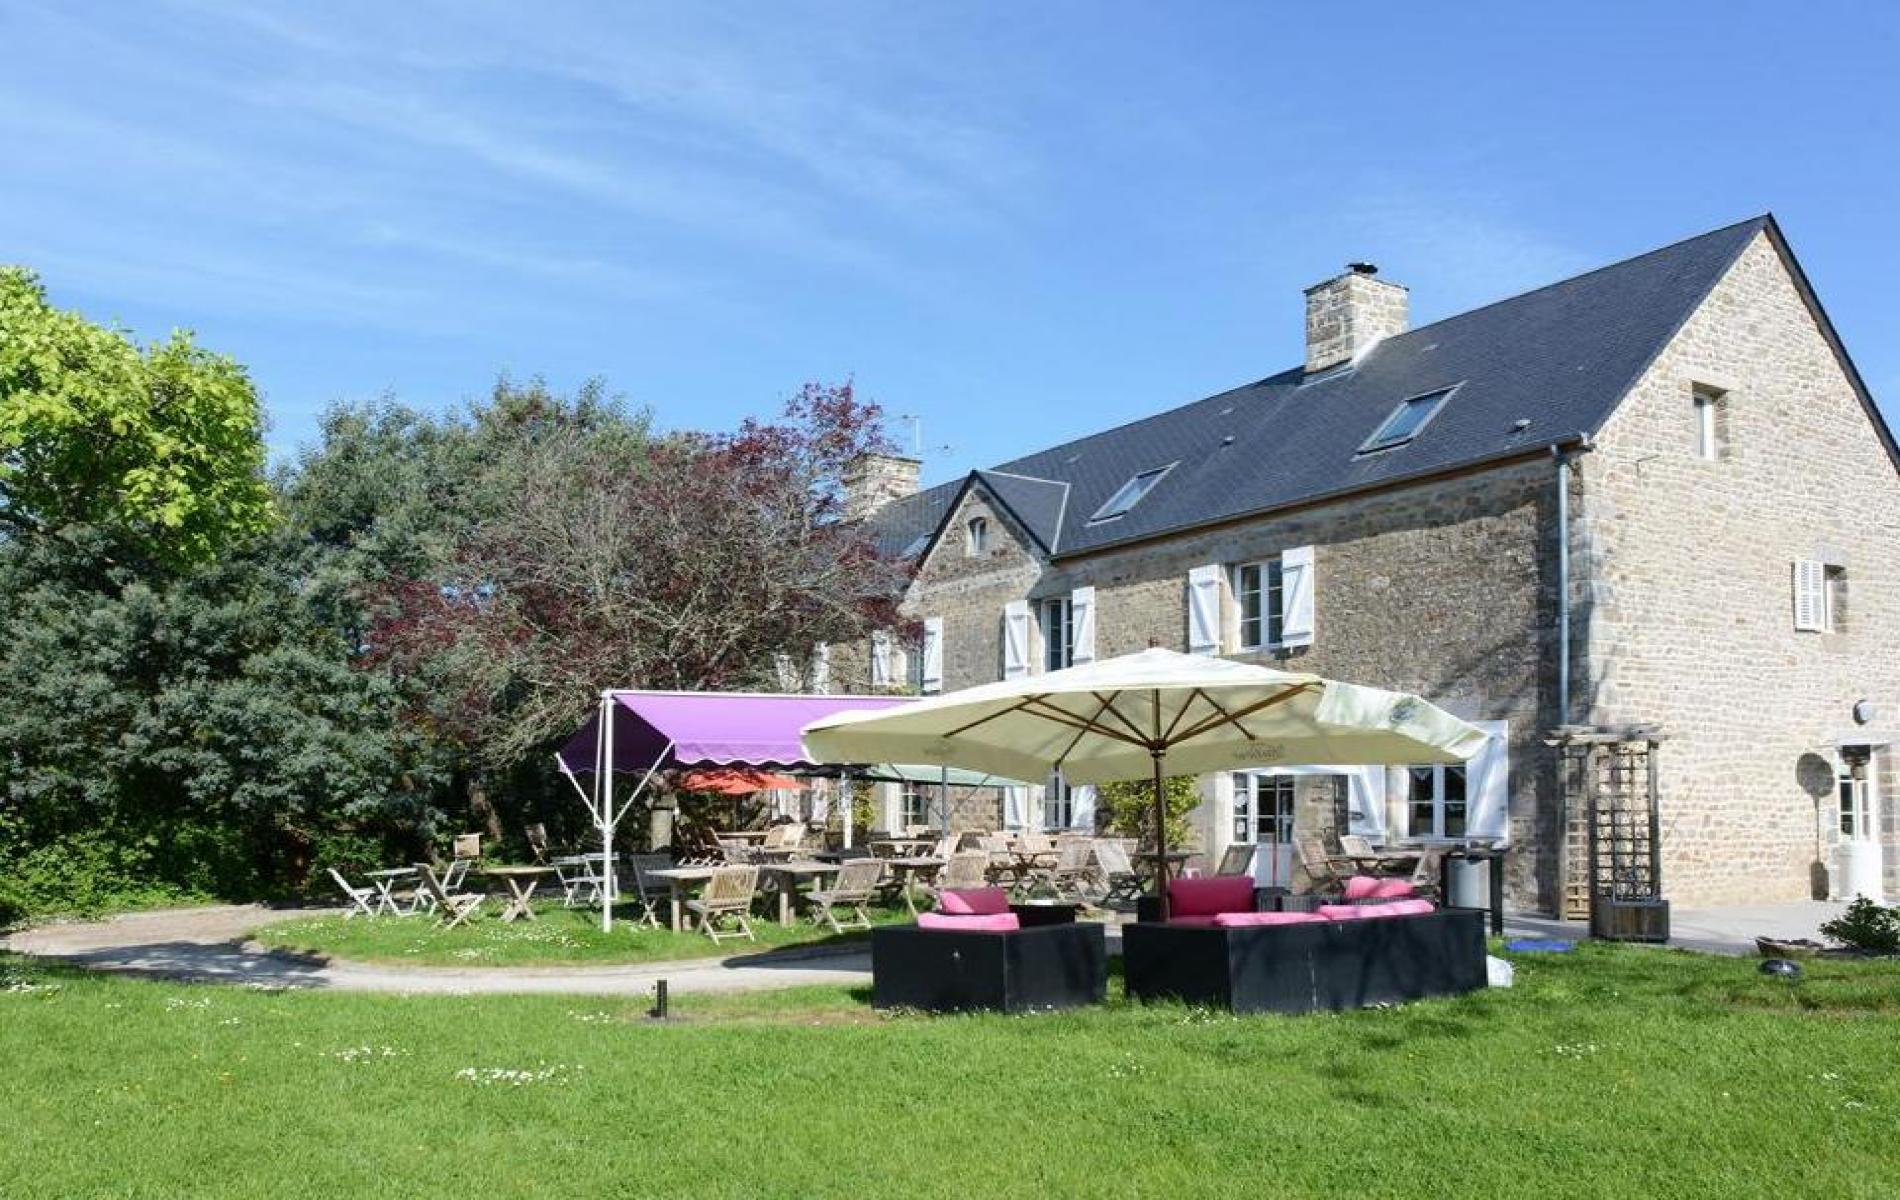 Auberge de Carolles - Hotel de charme en Normandie